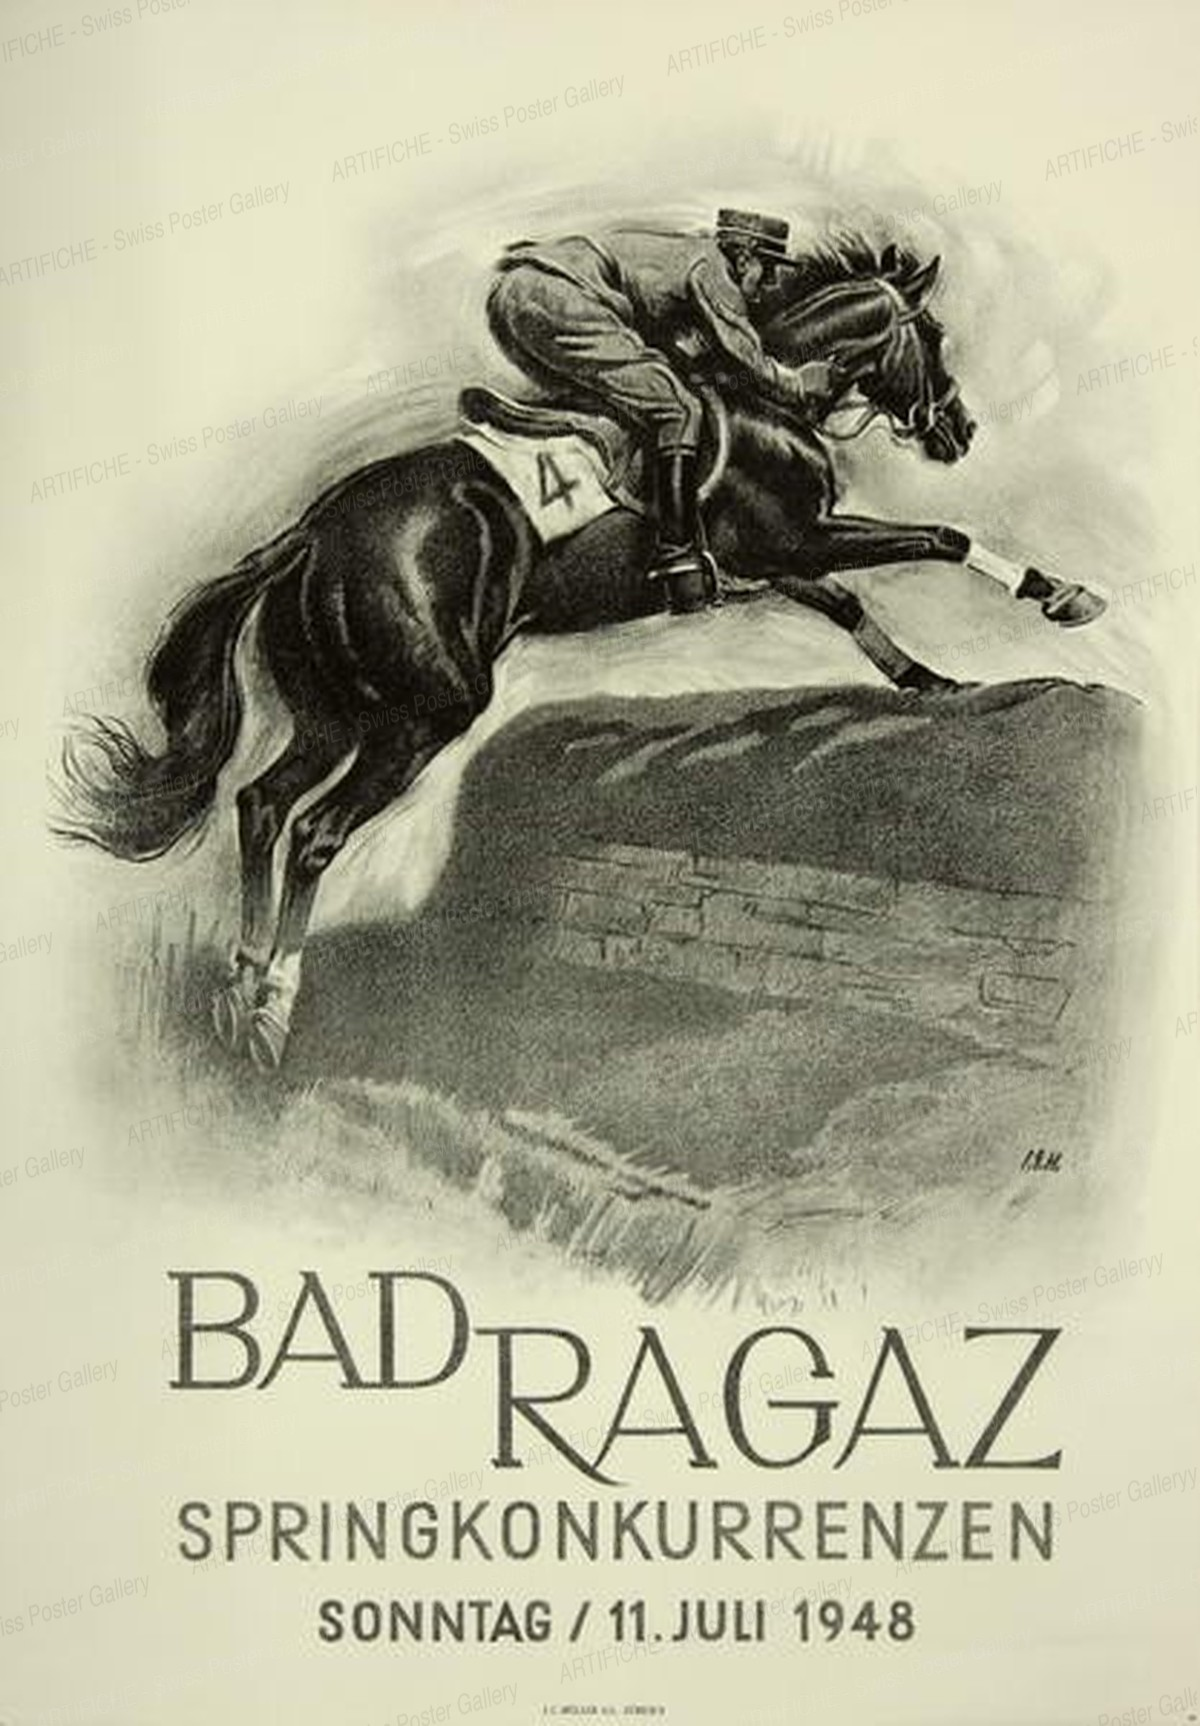 BAD RAGAZ Springkonkurrenzen – Sonntag, 11. Juli 1948, Iwan Edwin Hugentobler